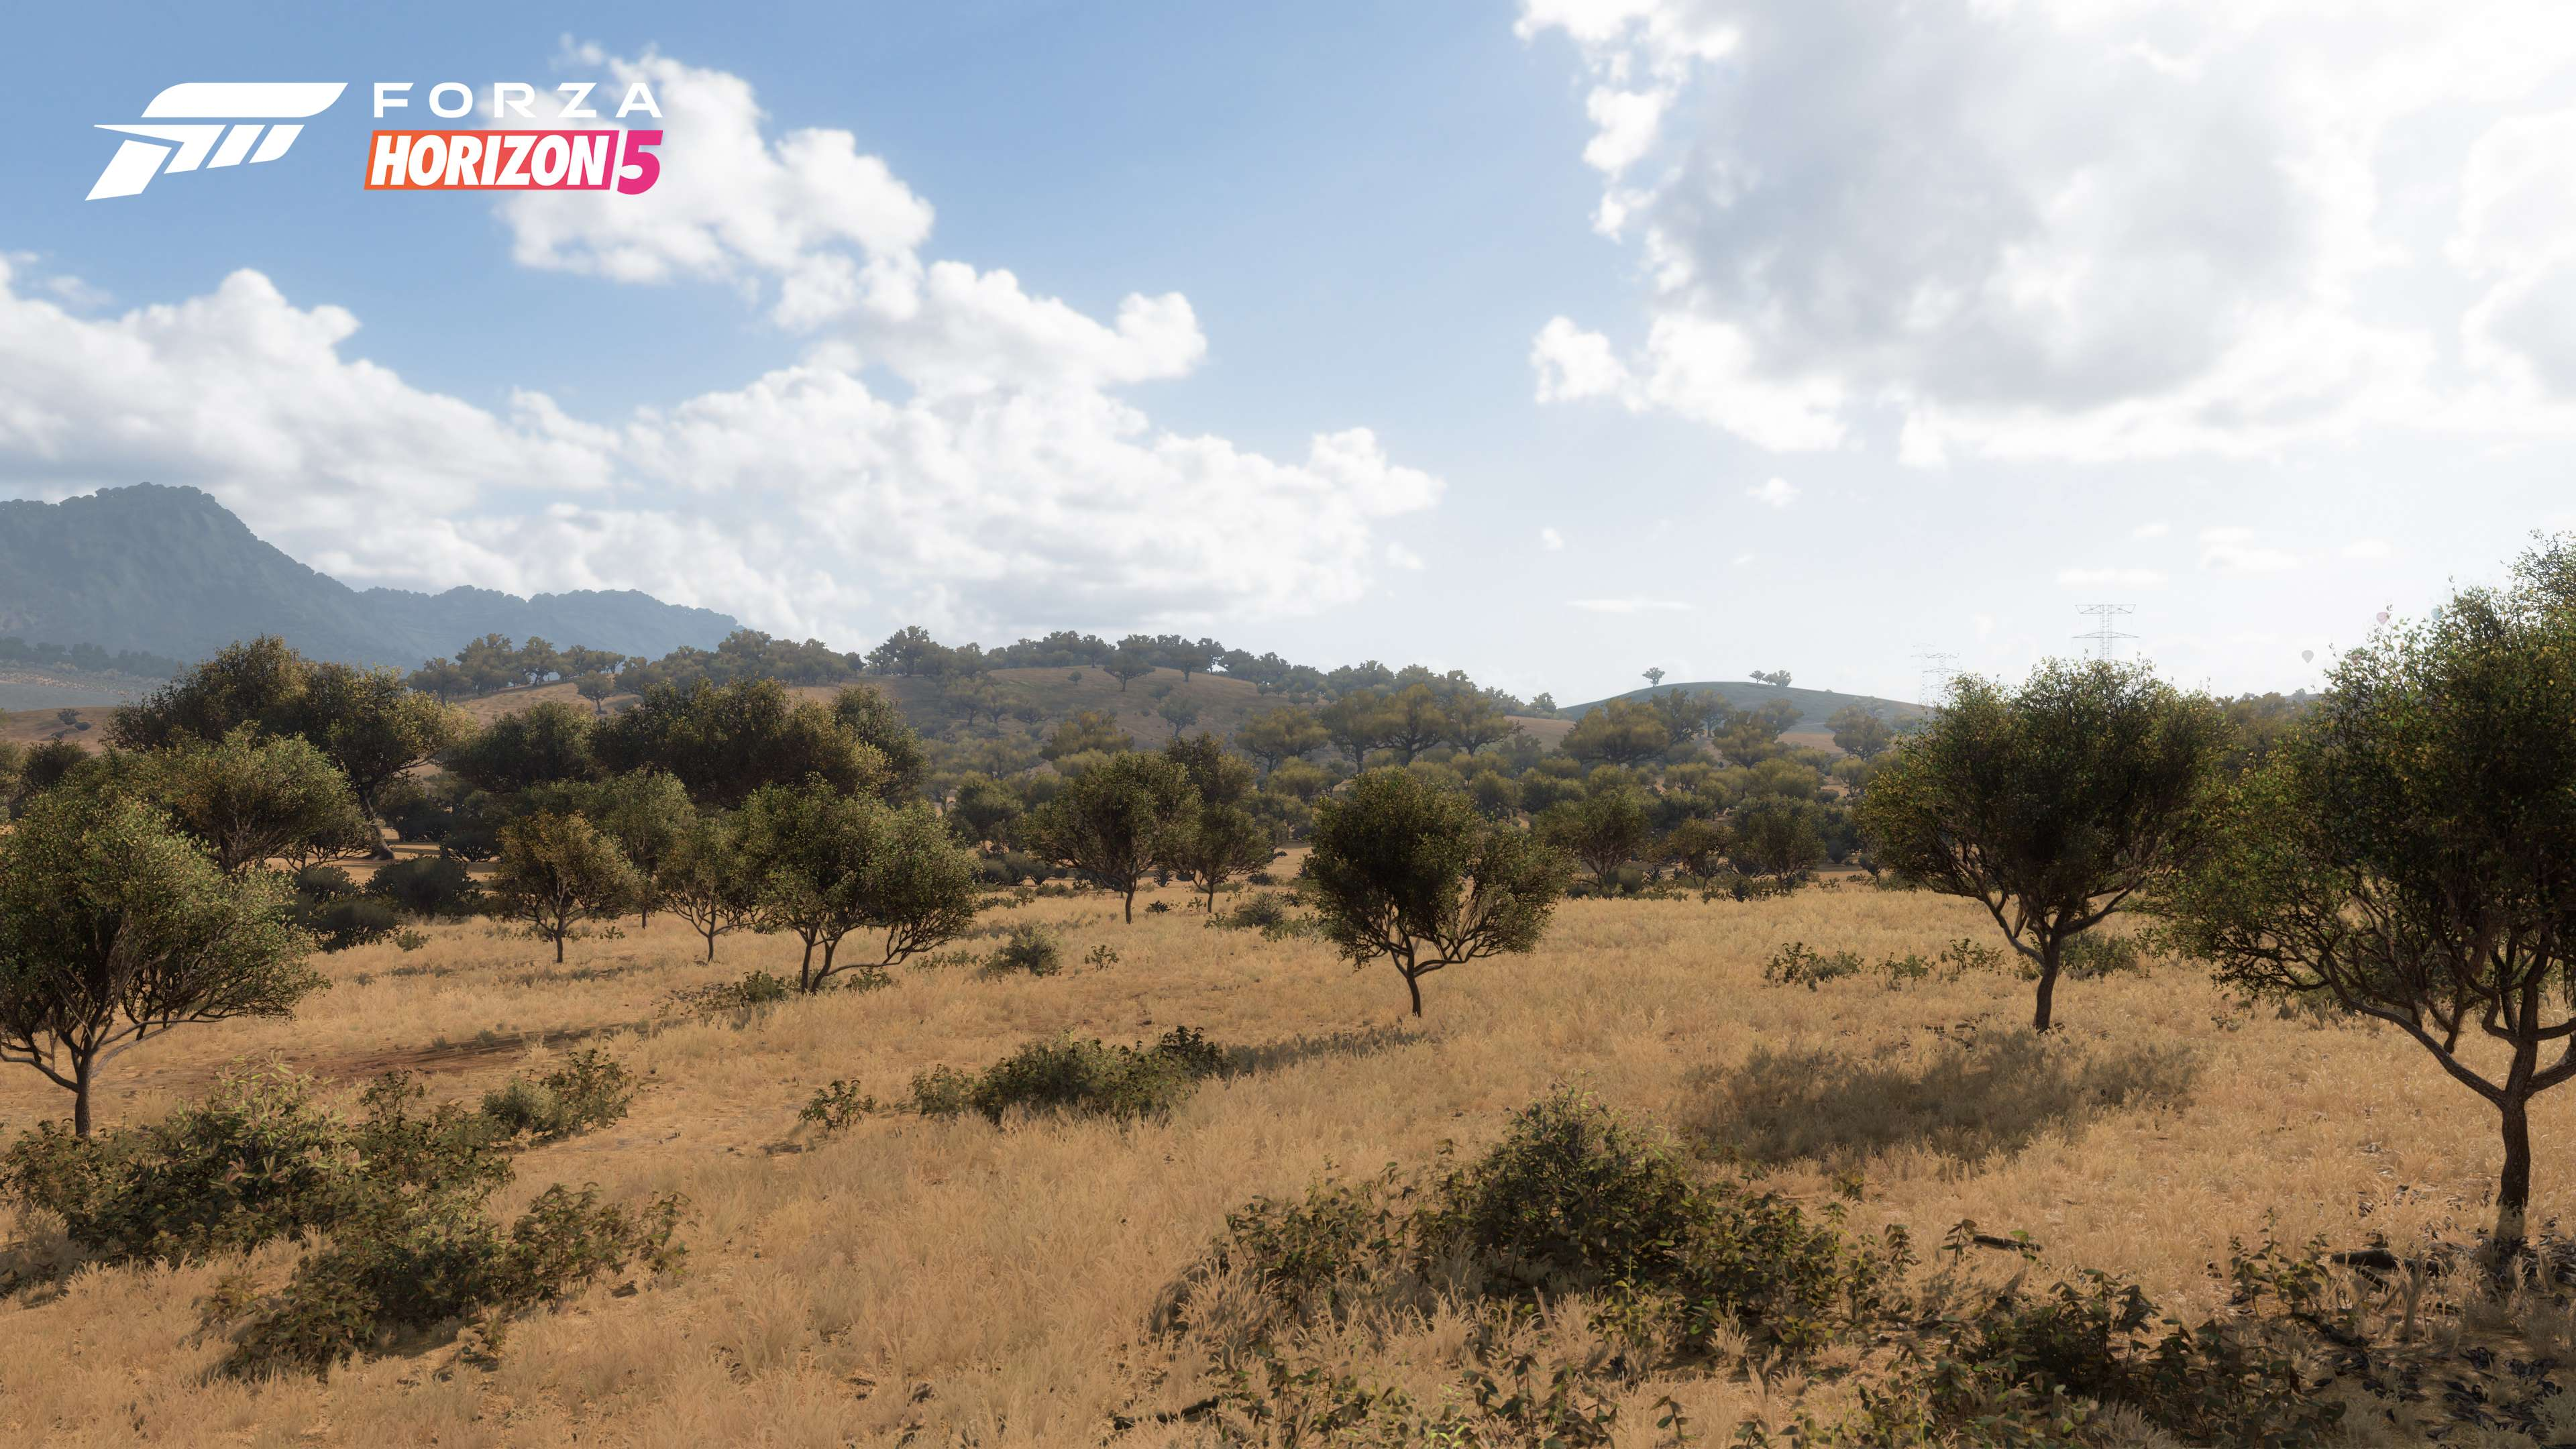 Forza Horizon 5 Arid Hills